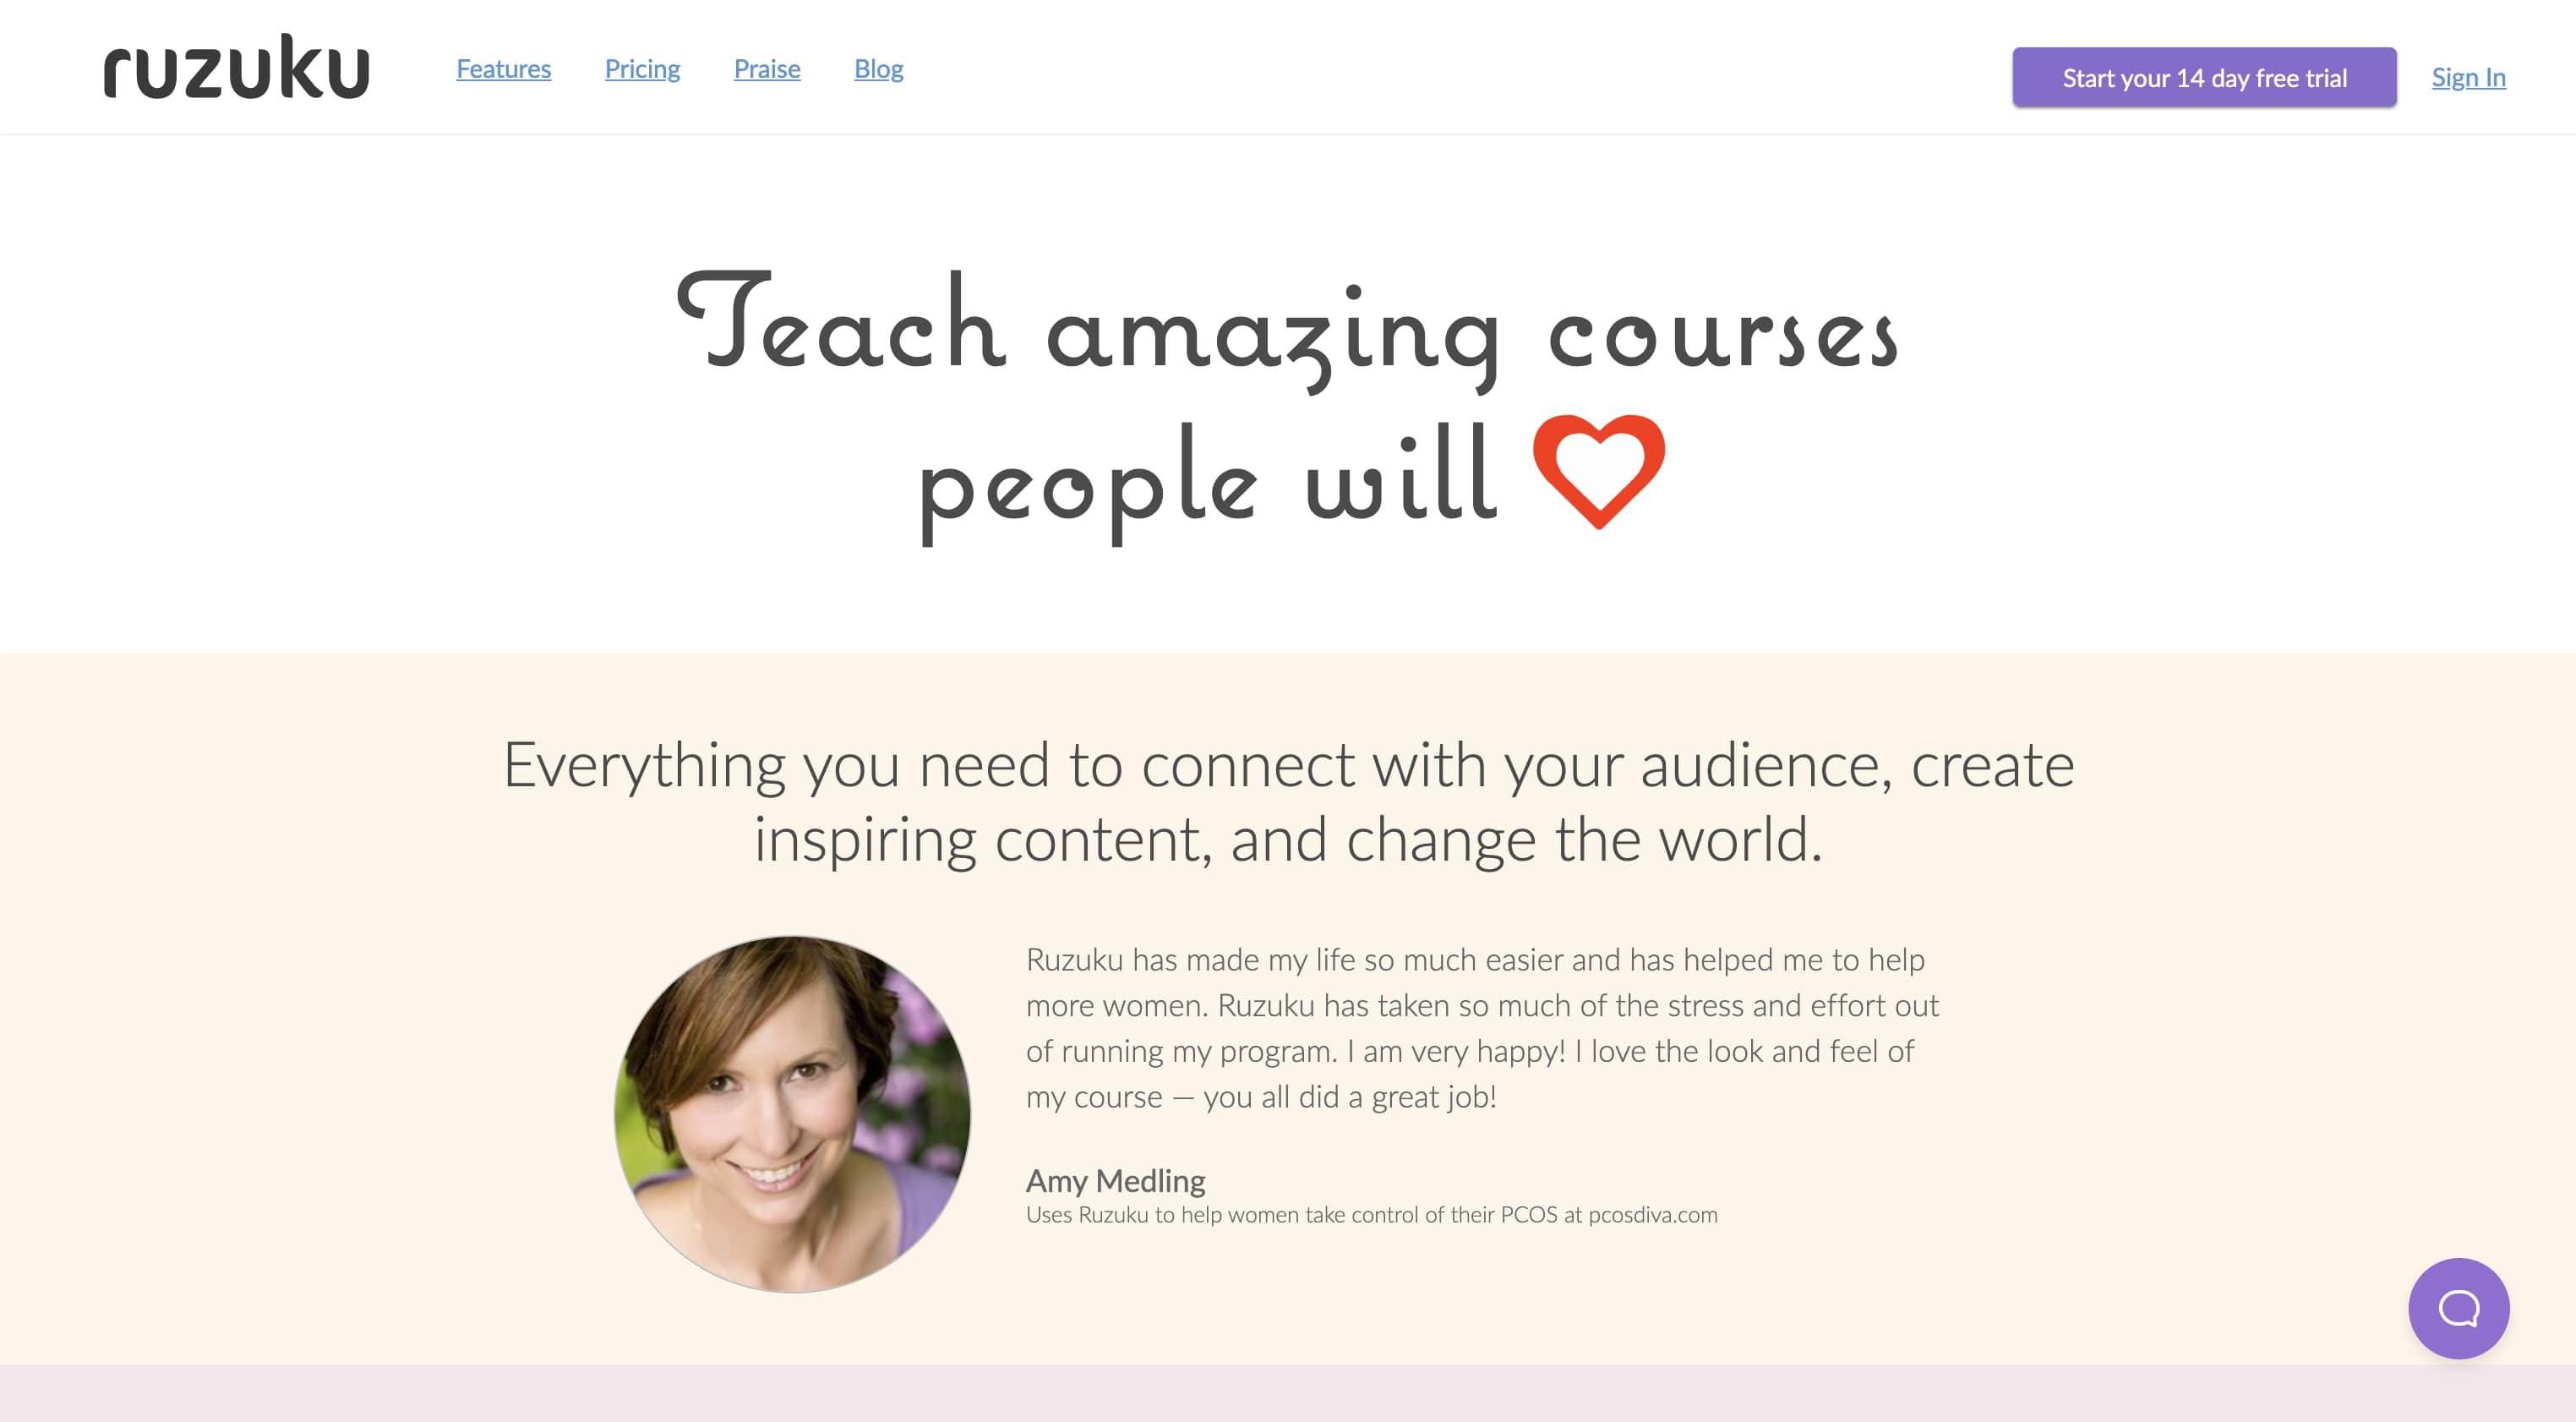 An image of the Ruzuku website.